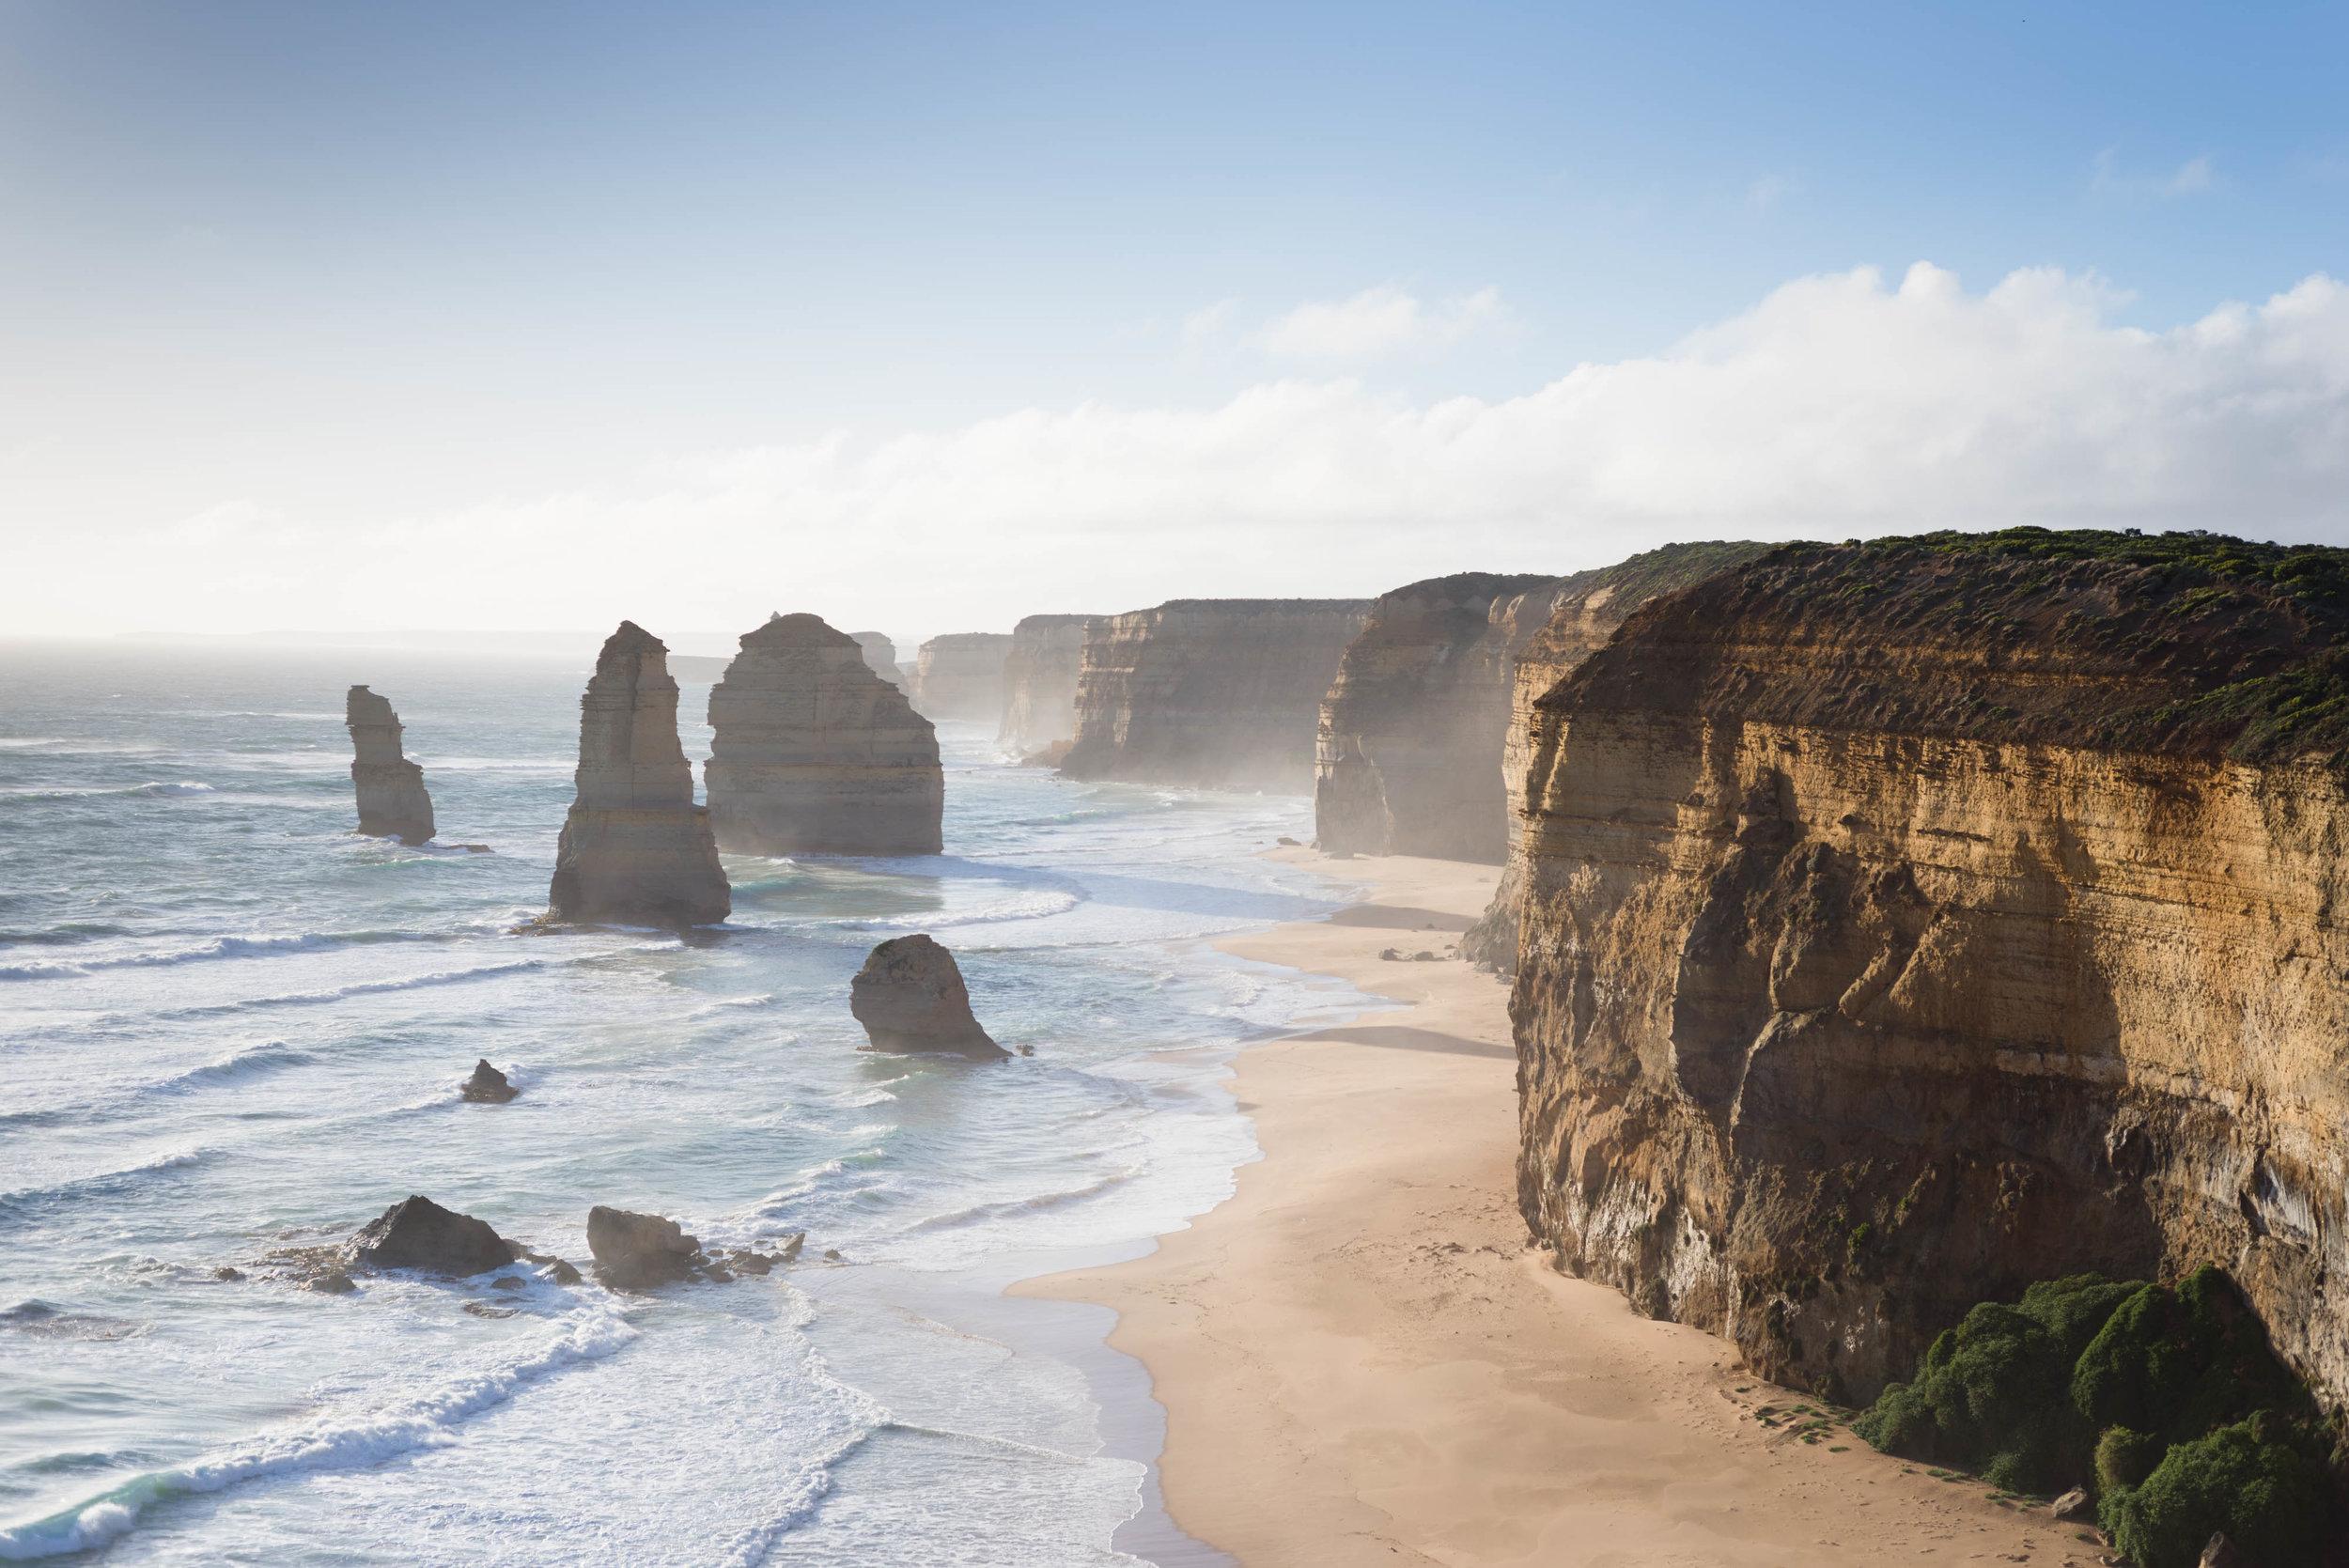 12 apostles great ocean road victoria